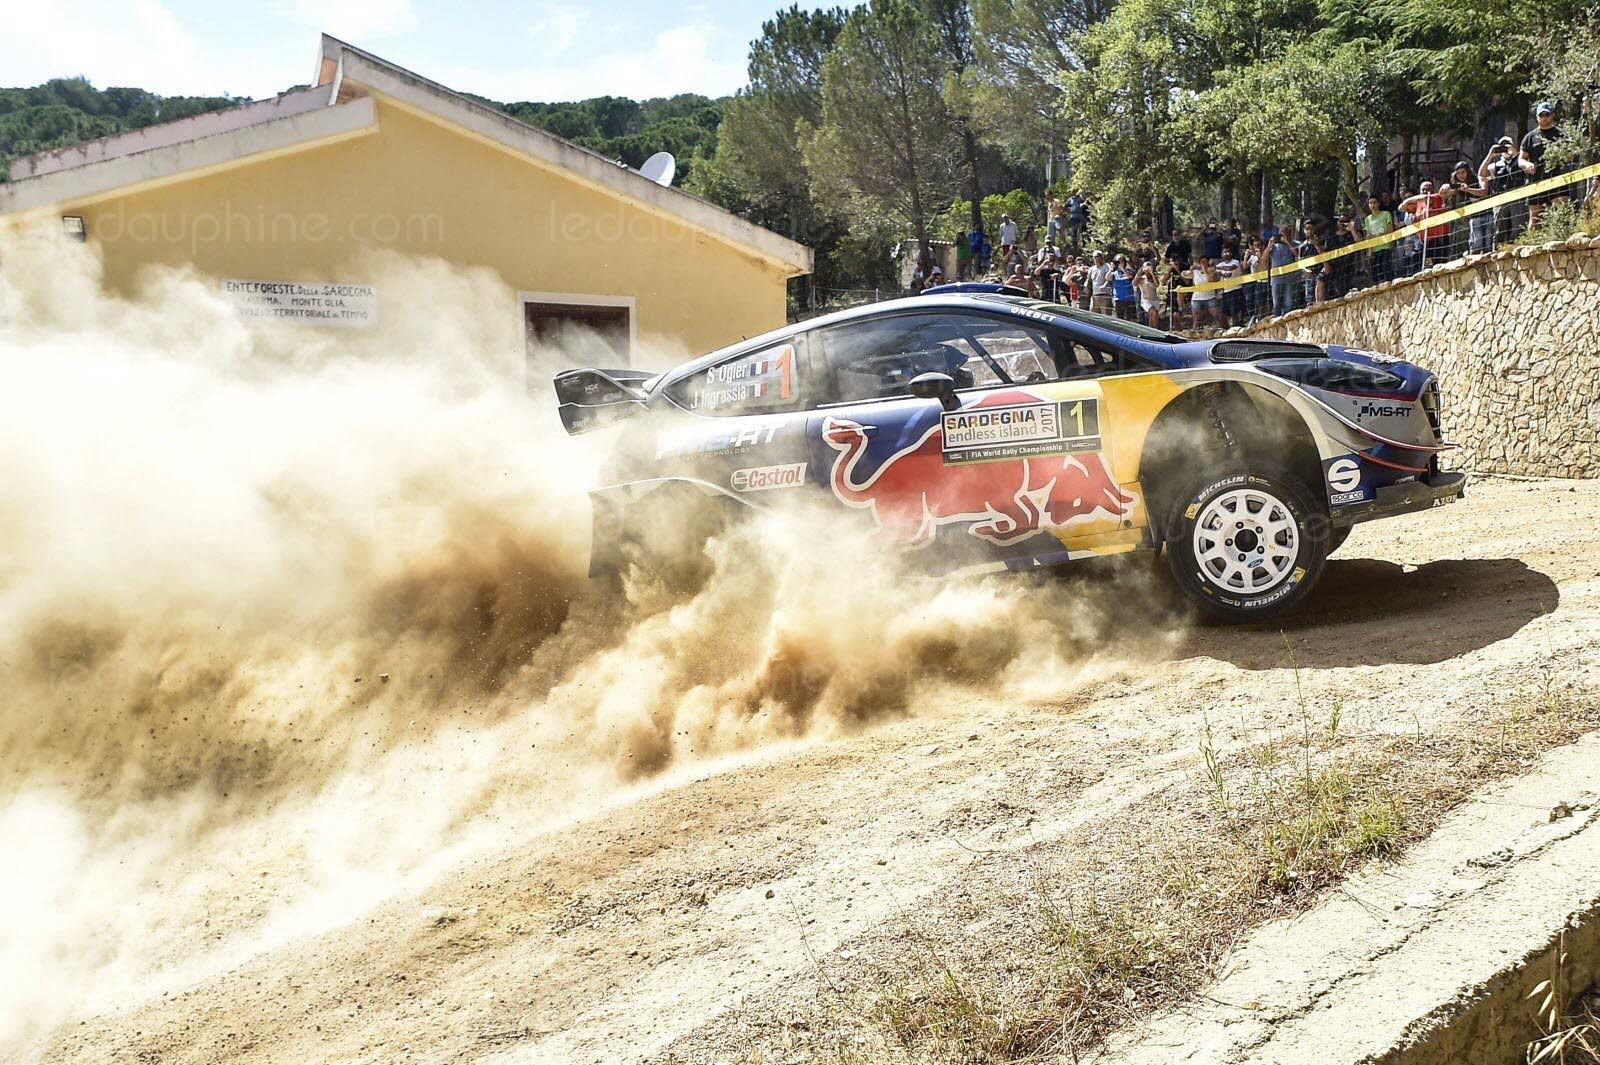 rallye-de-sardaigne-2017-victoire-d-ott-tanak-ford-premiere-de-sa-carriere-344-2.jpg